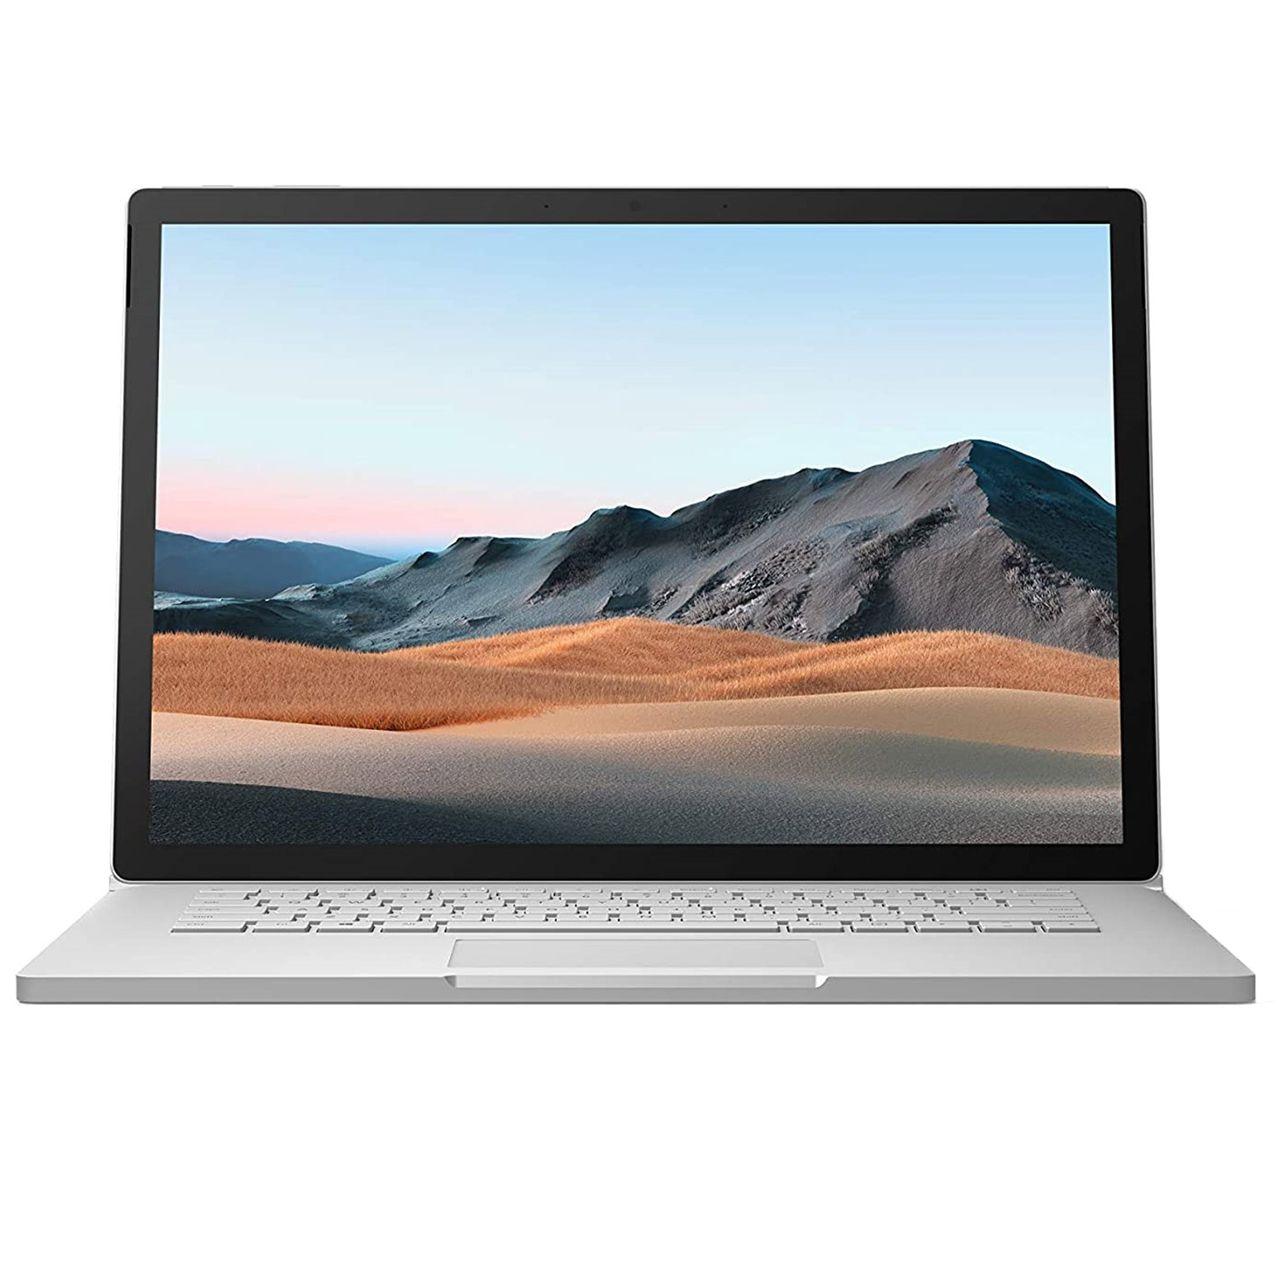 لپ تاپ 13 اینچی مایکروسافت مدل Surface Book 3- D